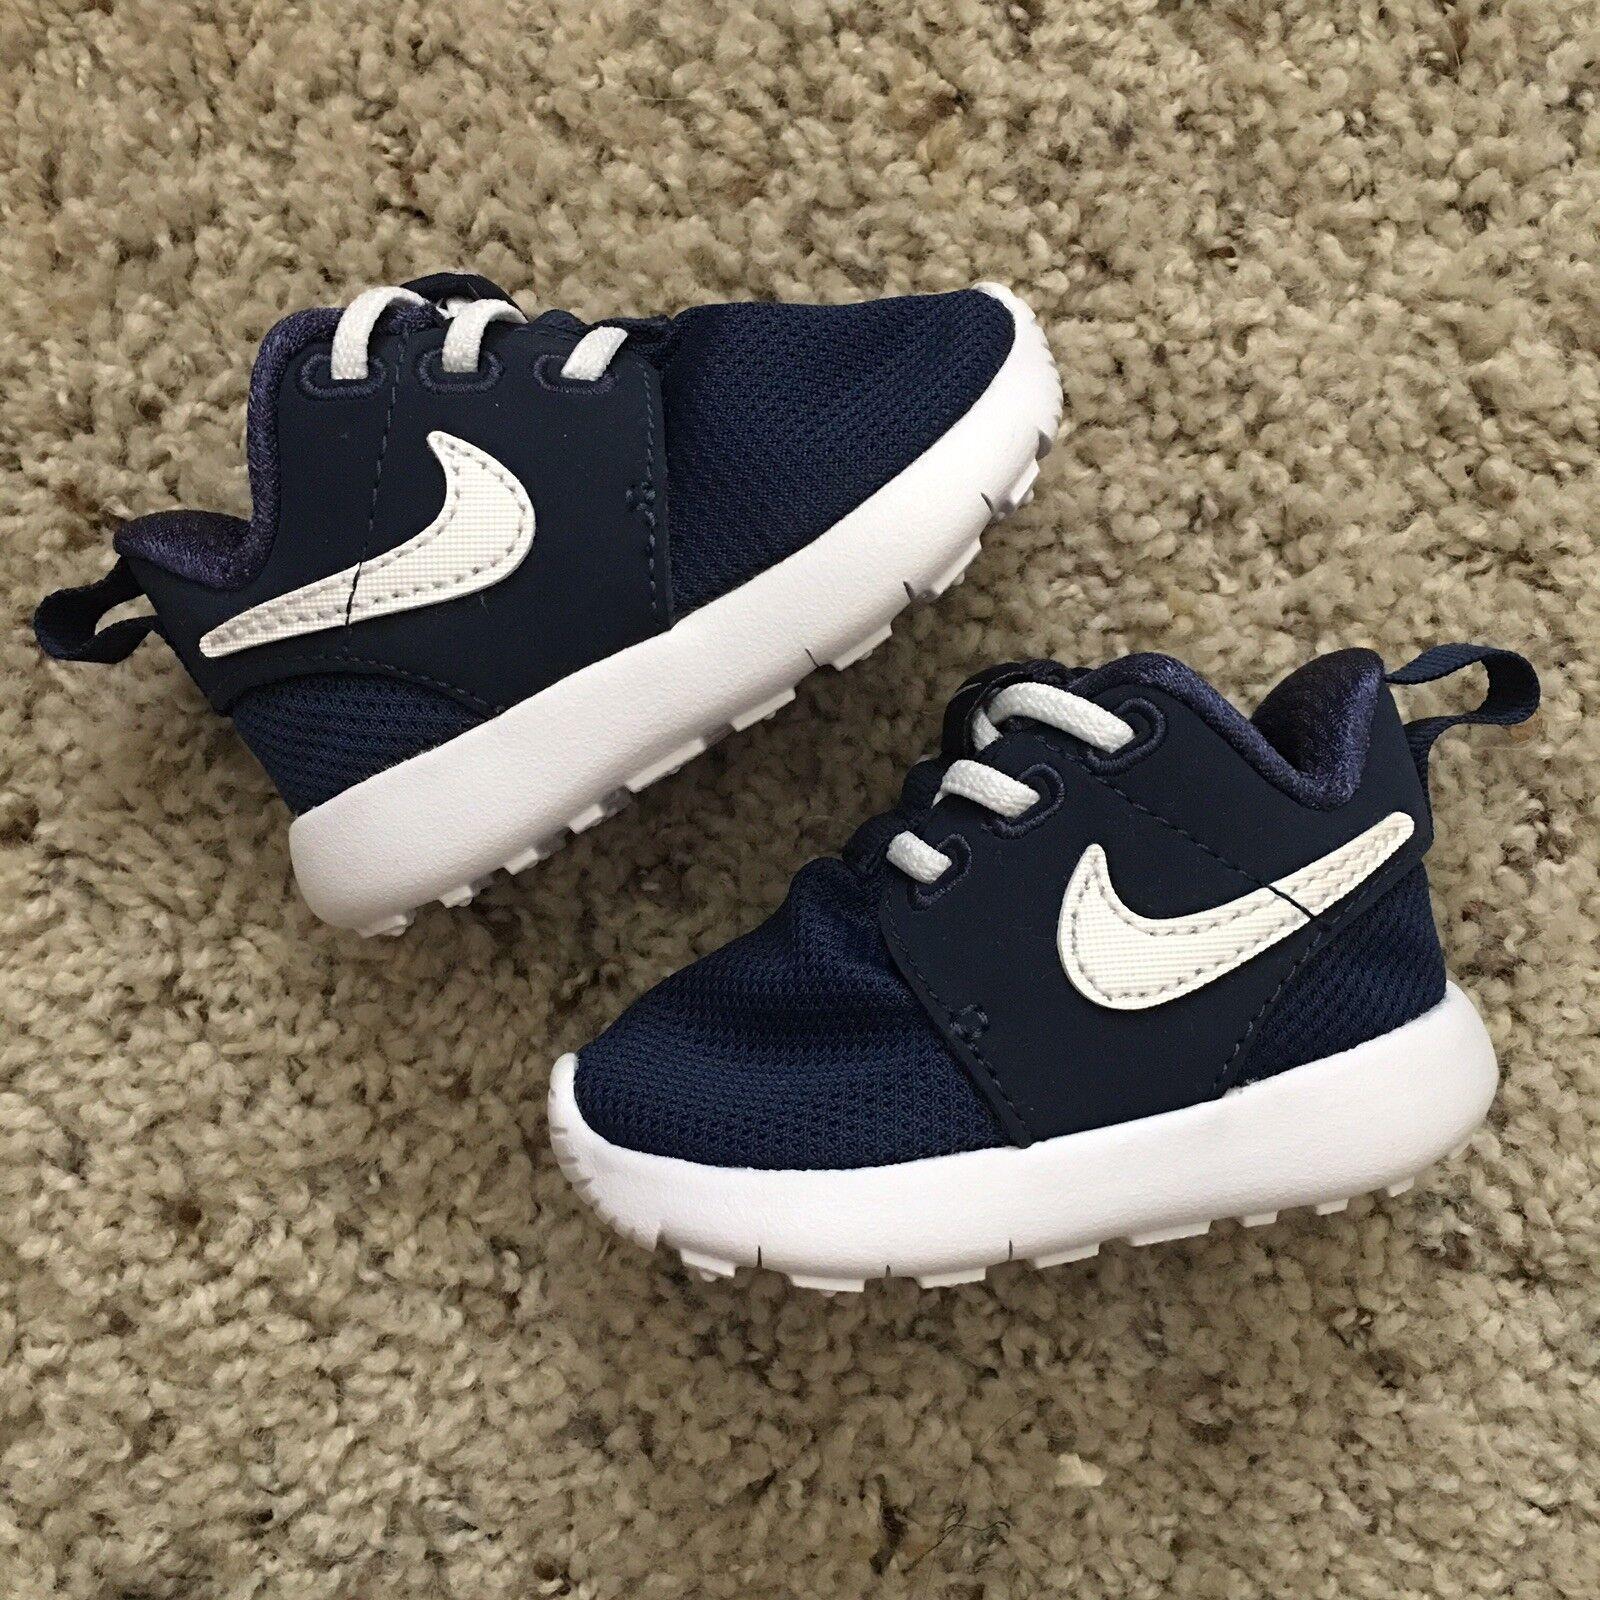 Nike Roshe One Blue Infant Size 2c Brand New in Box